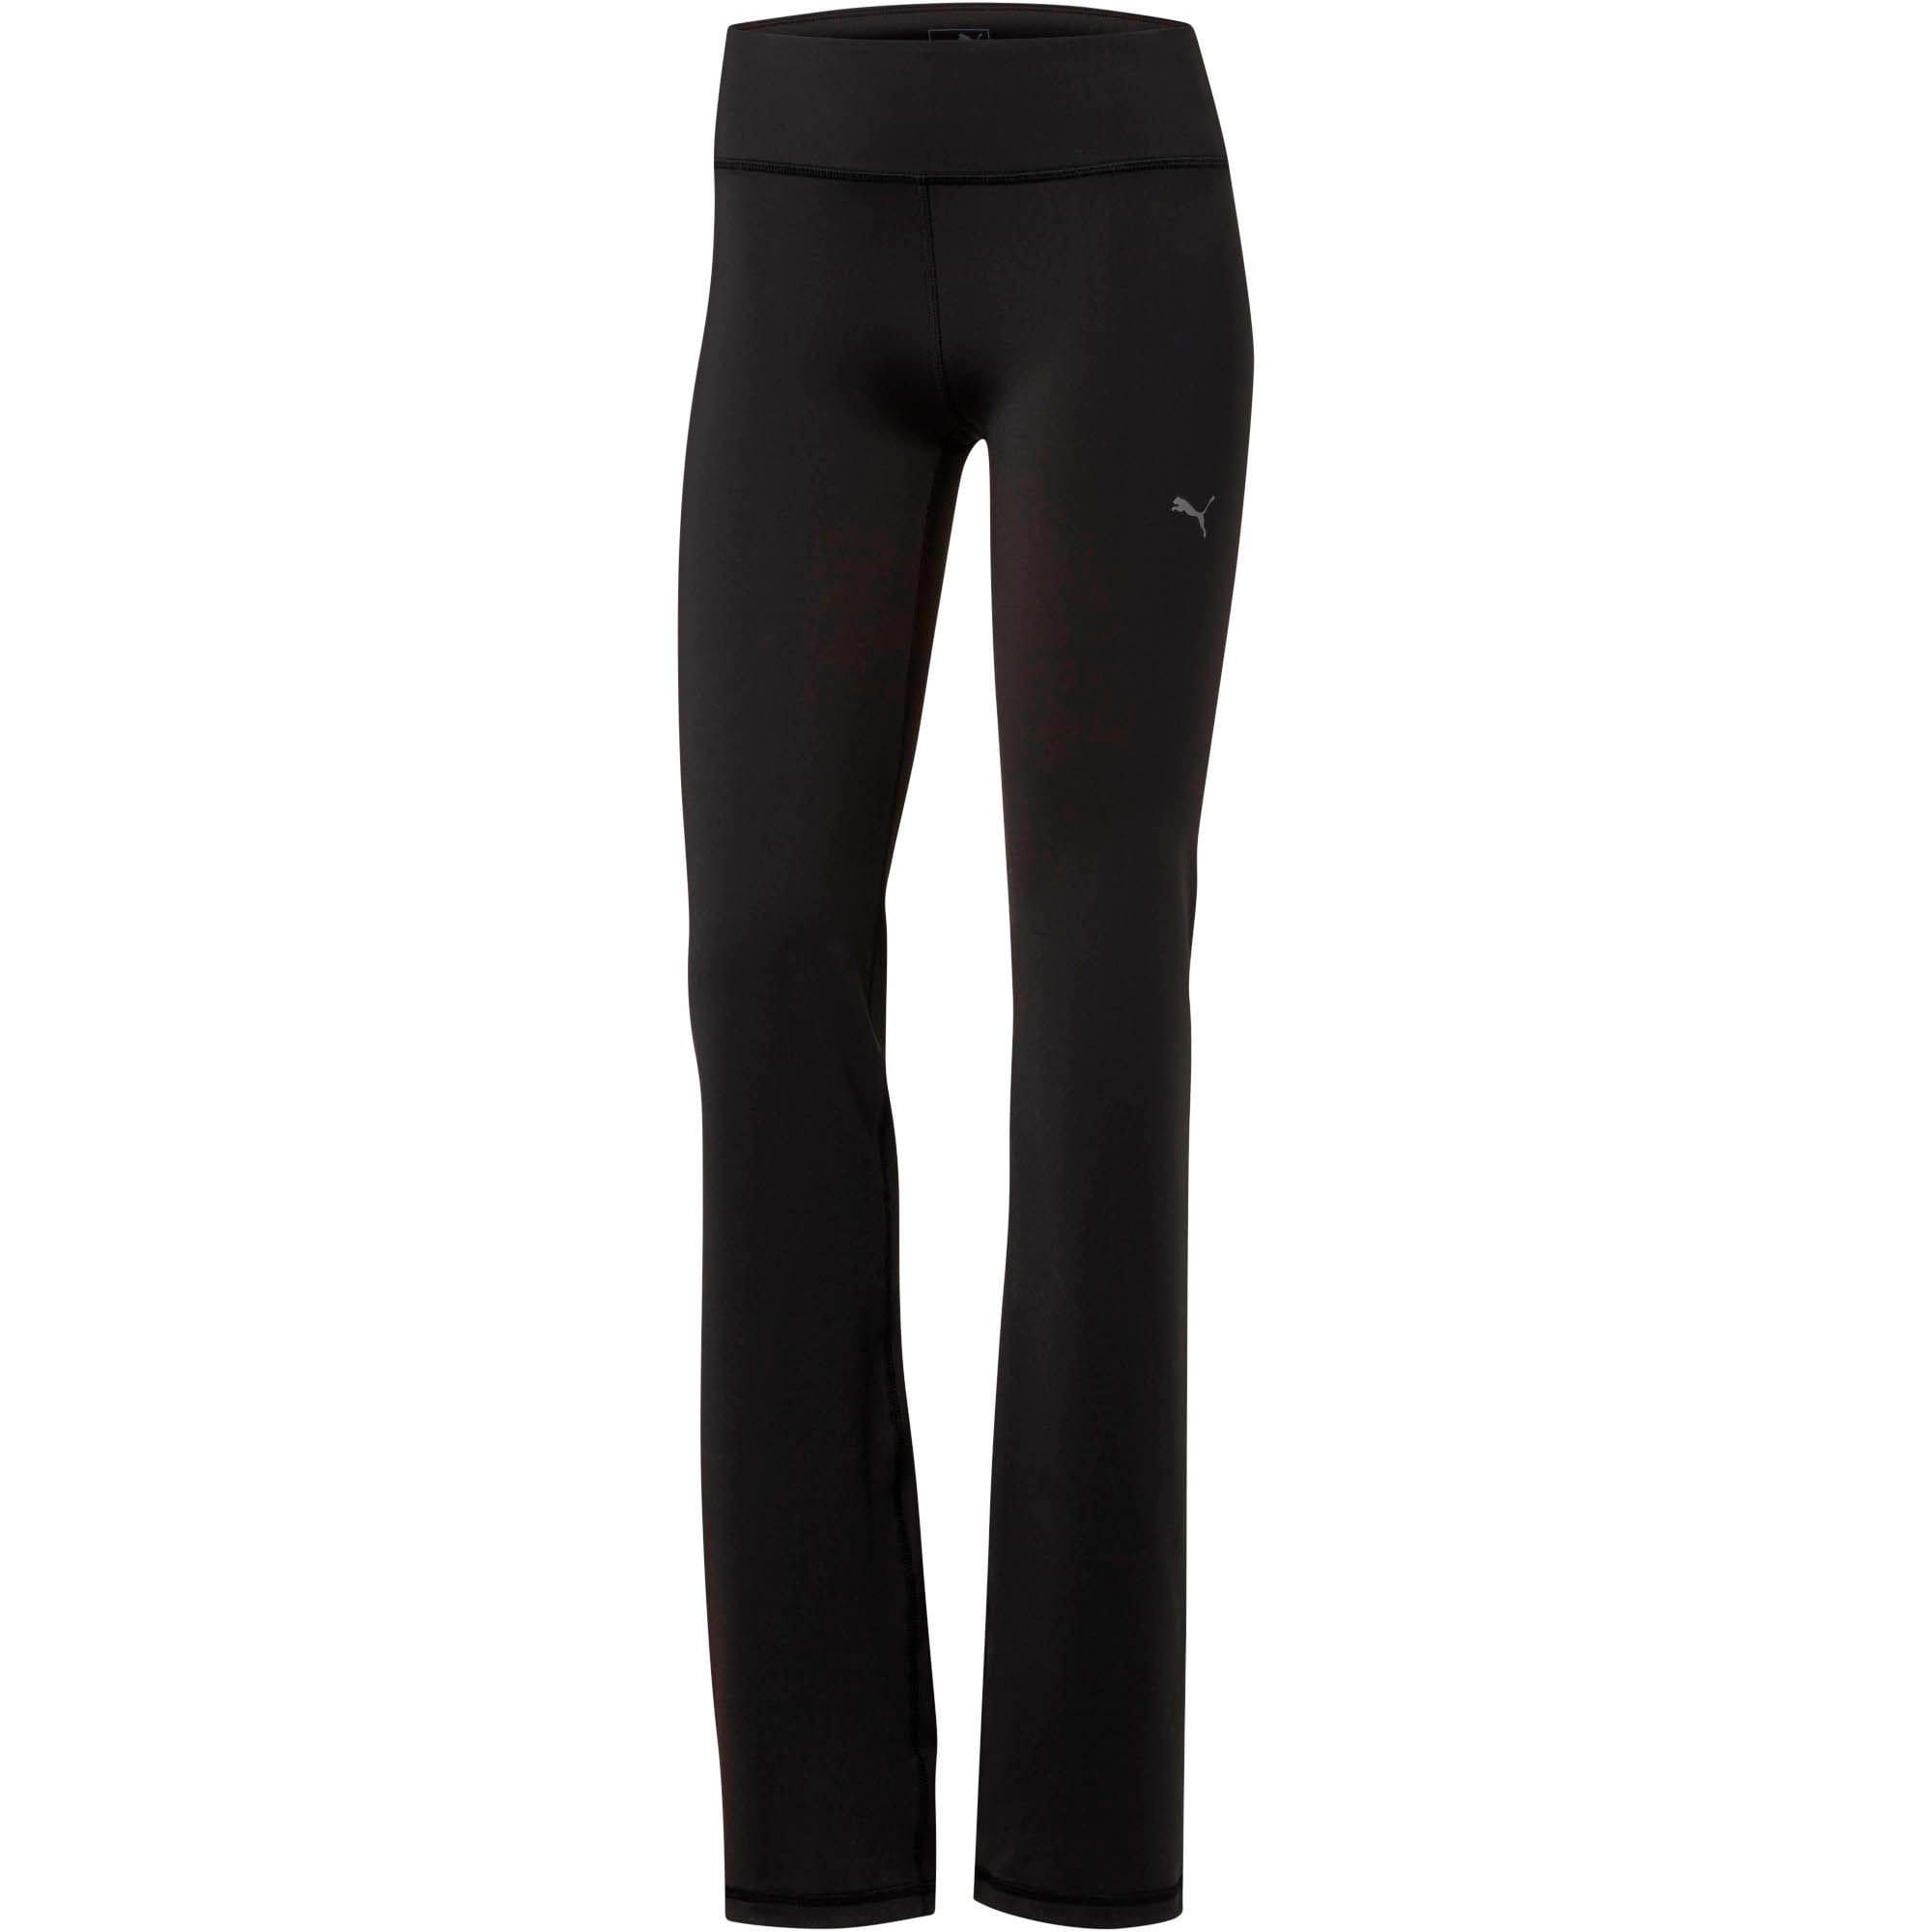 Thumbnail 1 of Fitness Essential Straight Leg Tights, Puma Black, medium